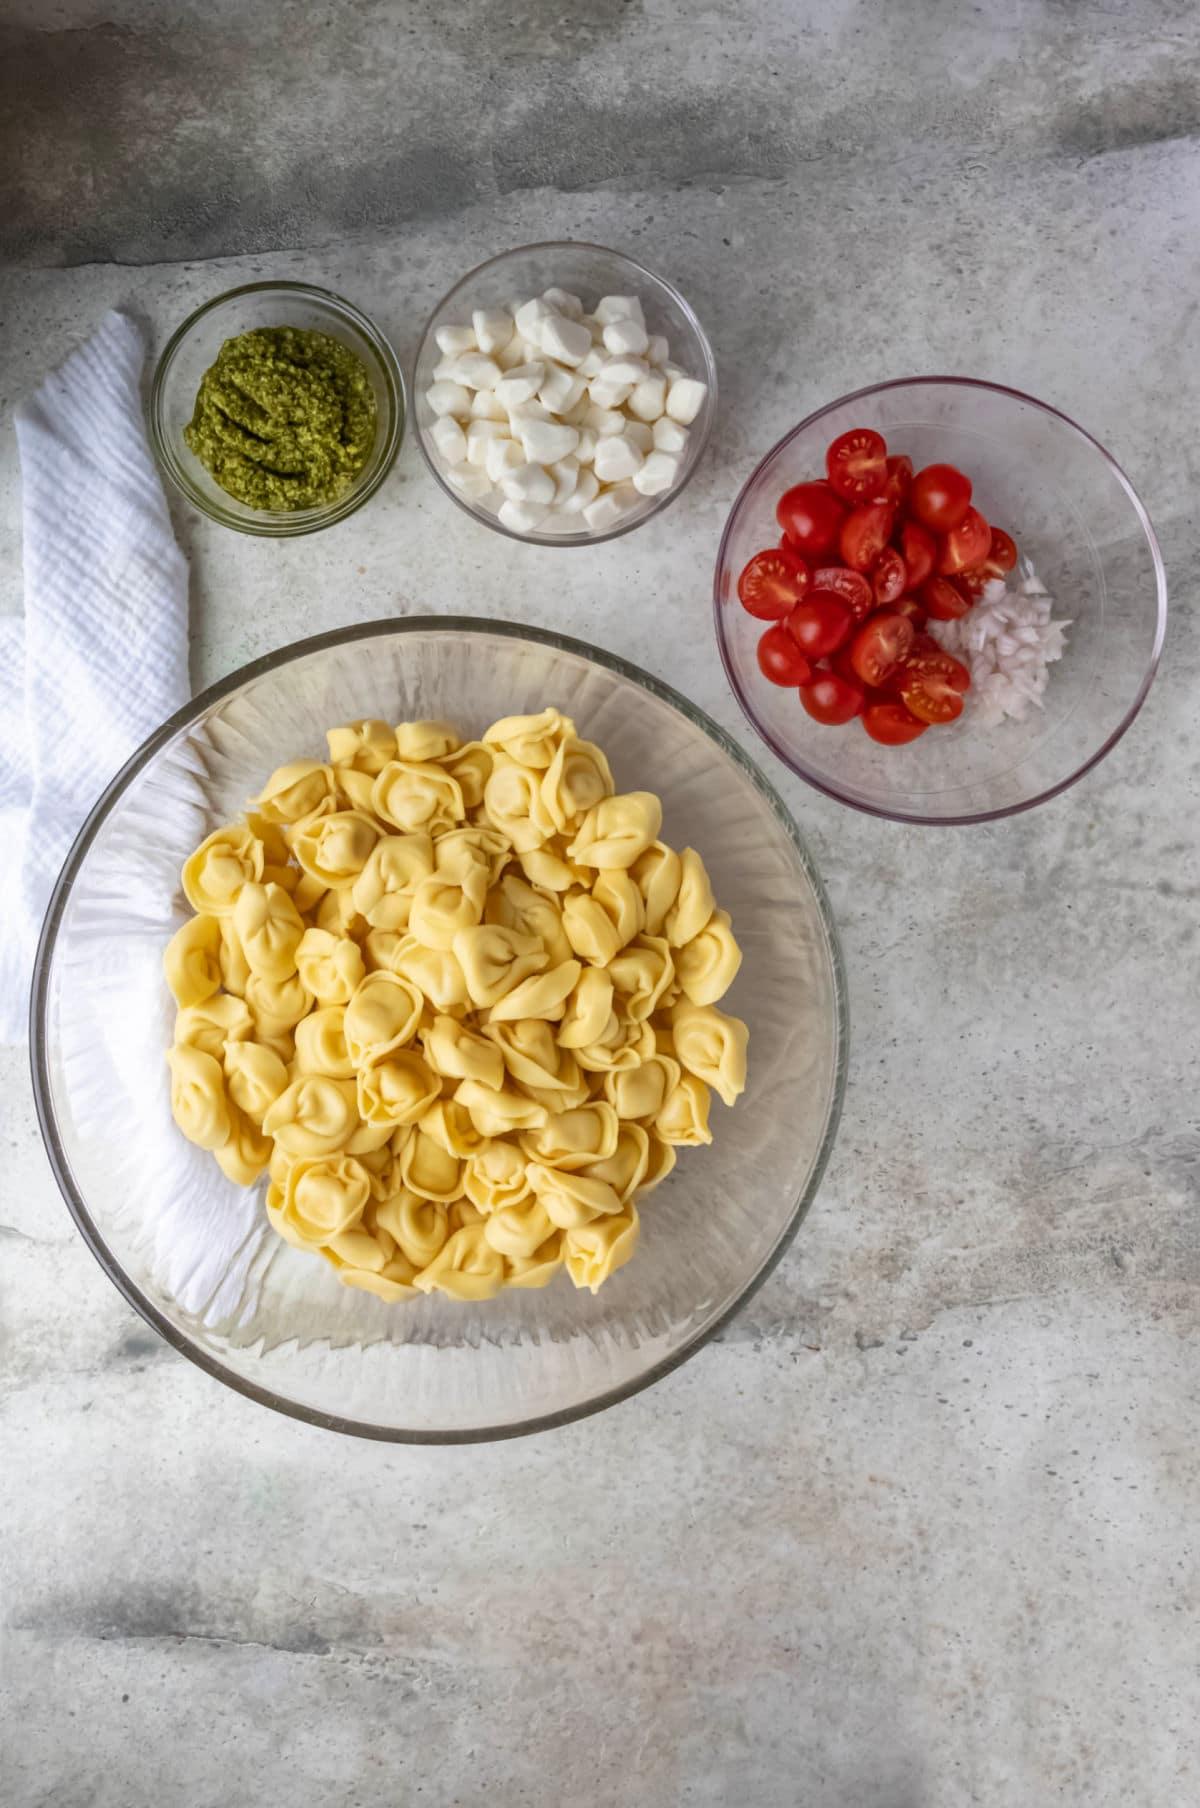 Fresh tortellini in a glass mixing bowl.